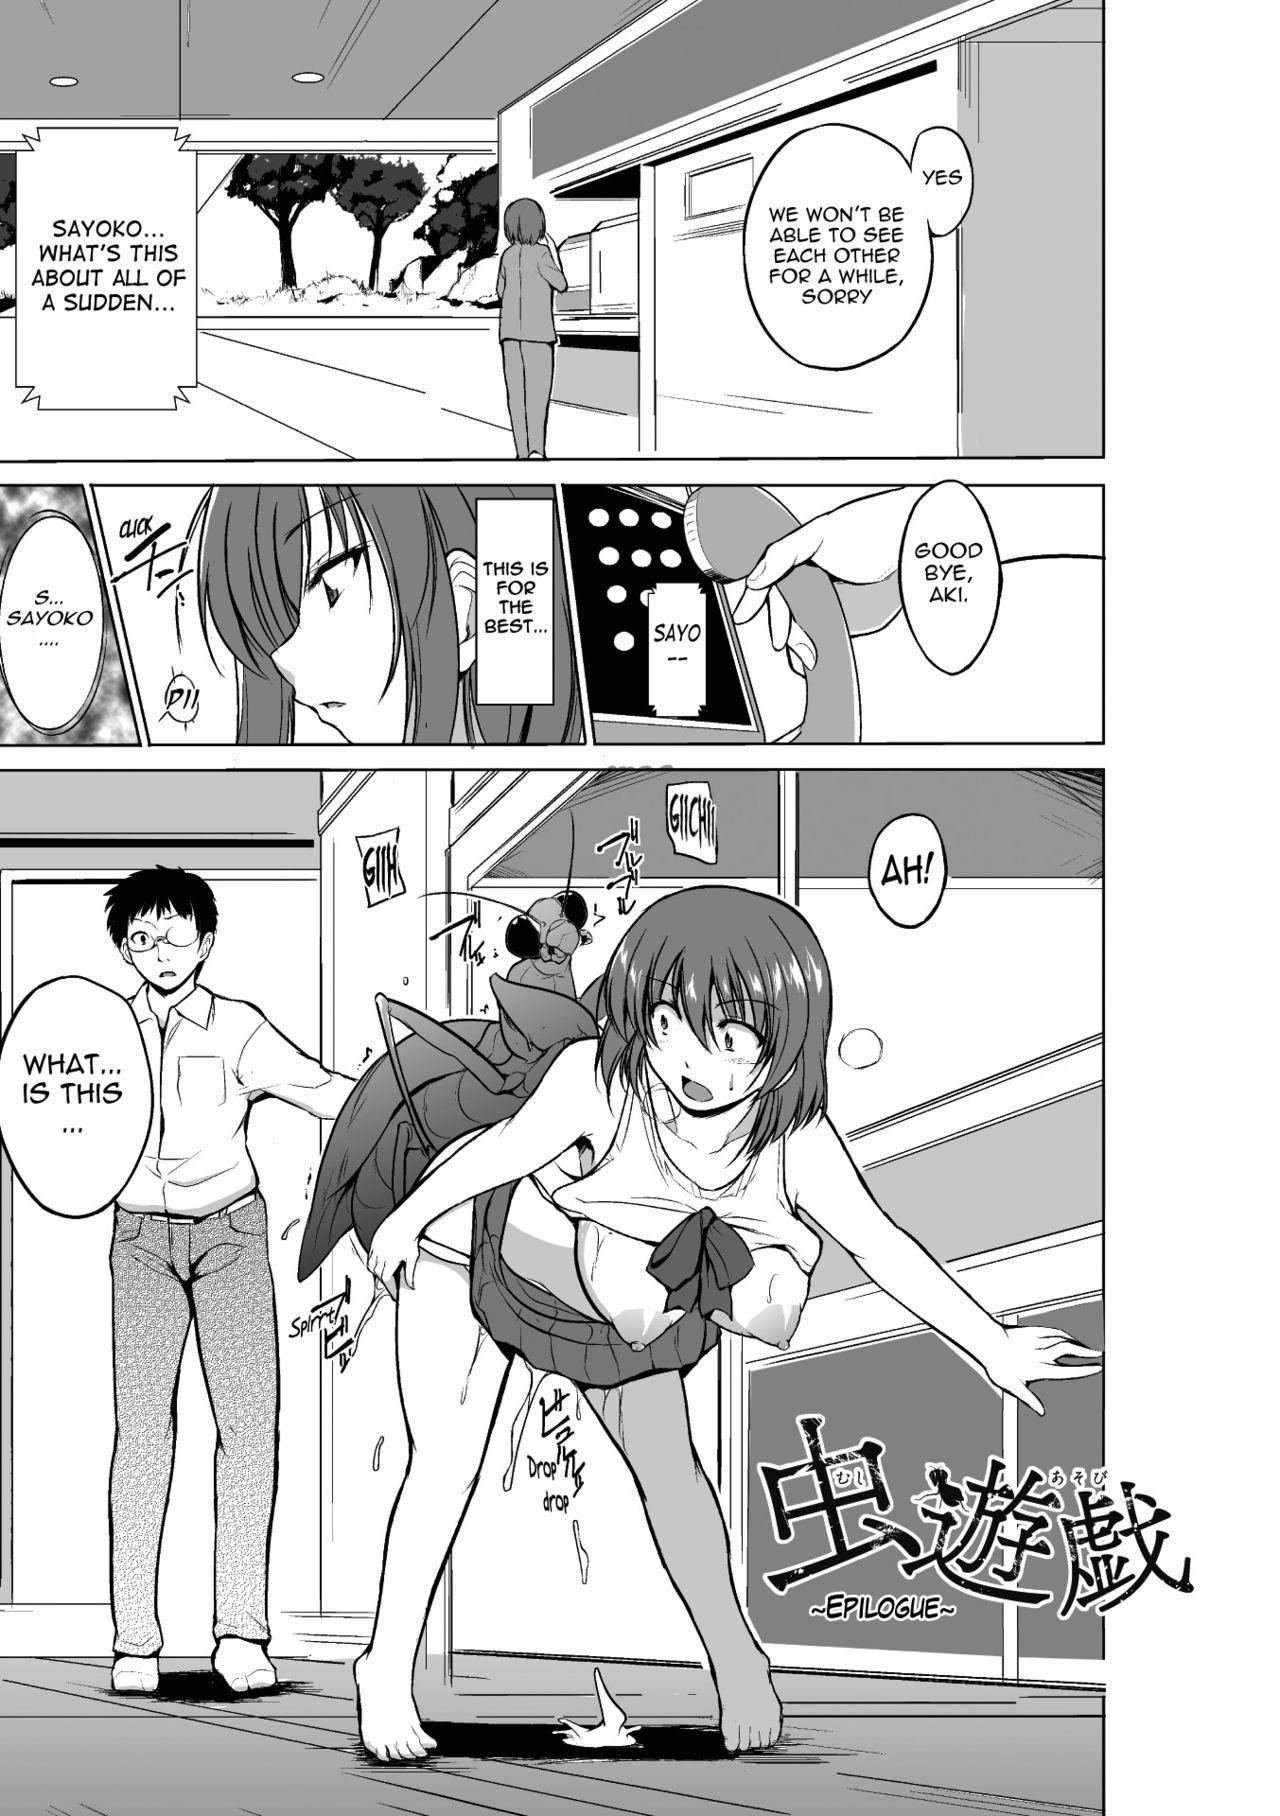 [Chiba Tetsutarou] Mushi Yuugi  -Mant - ENG 82